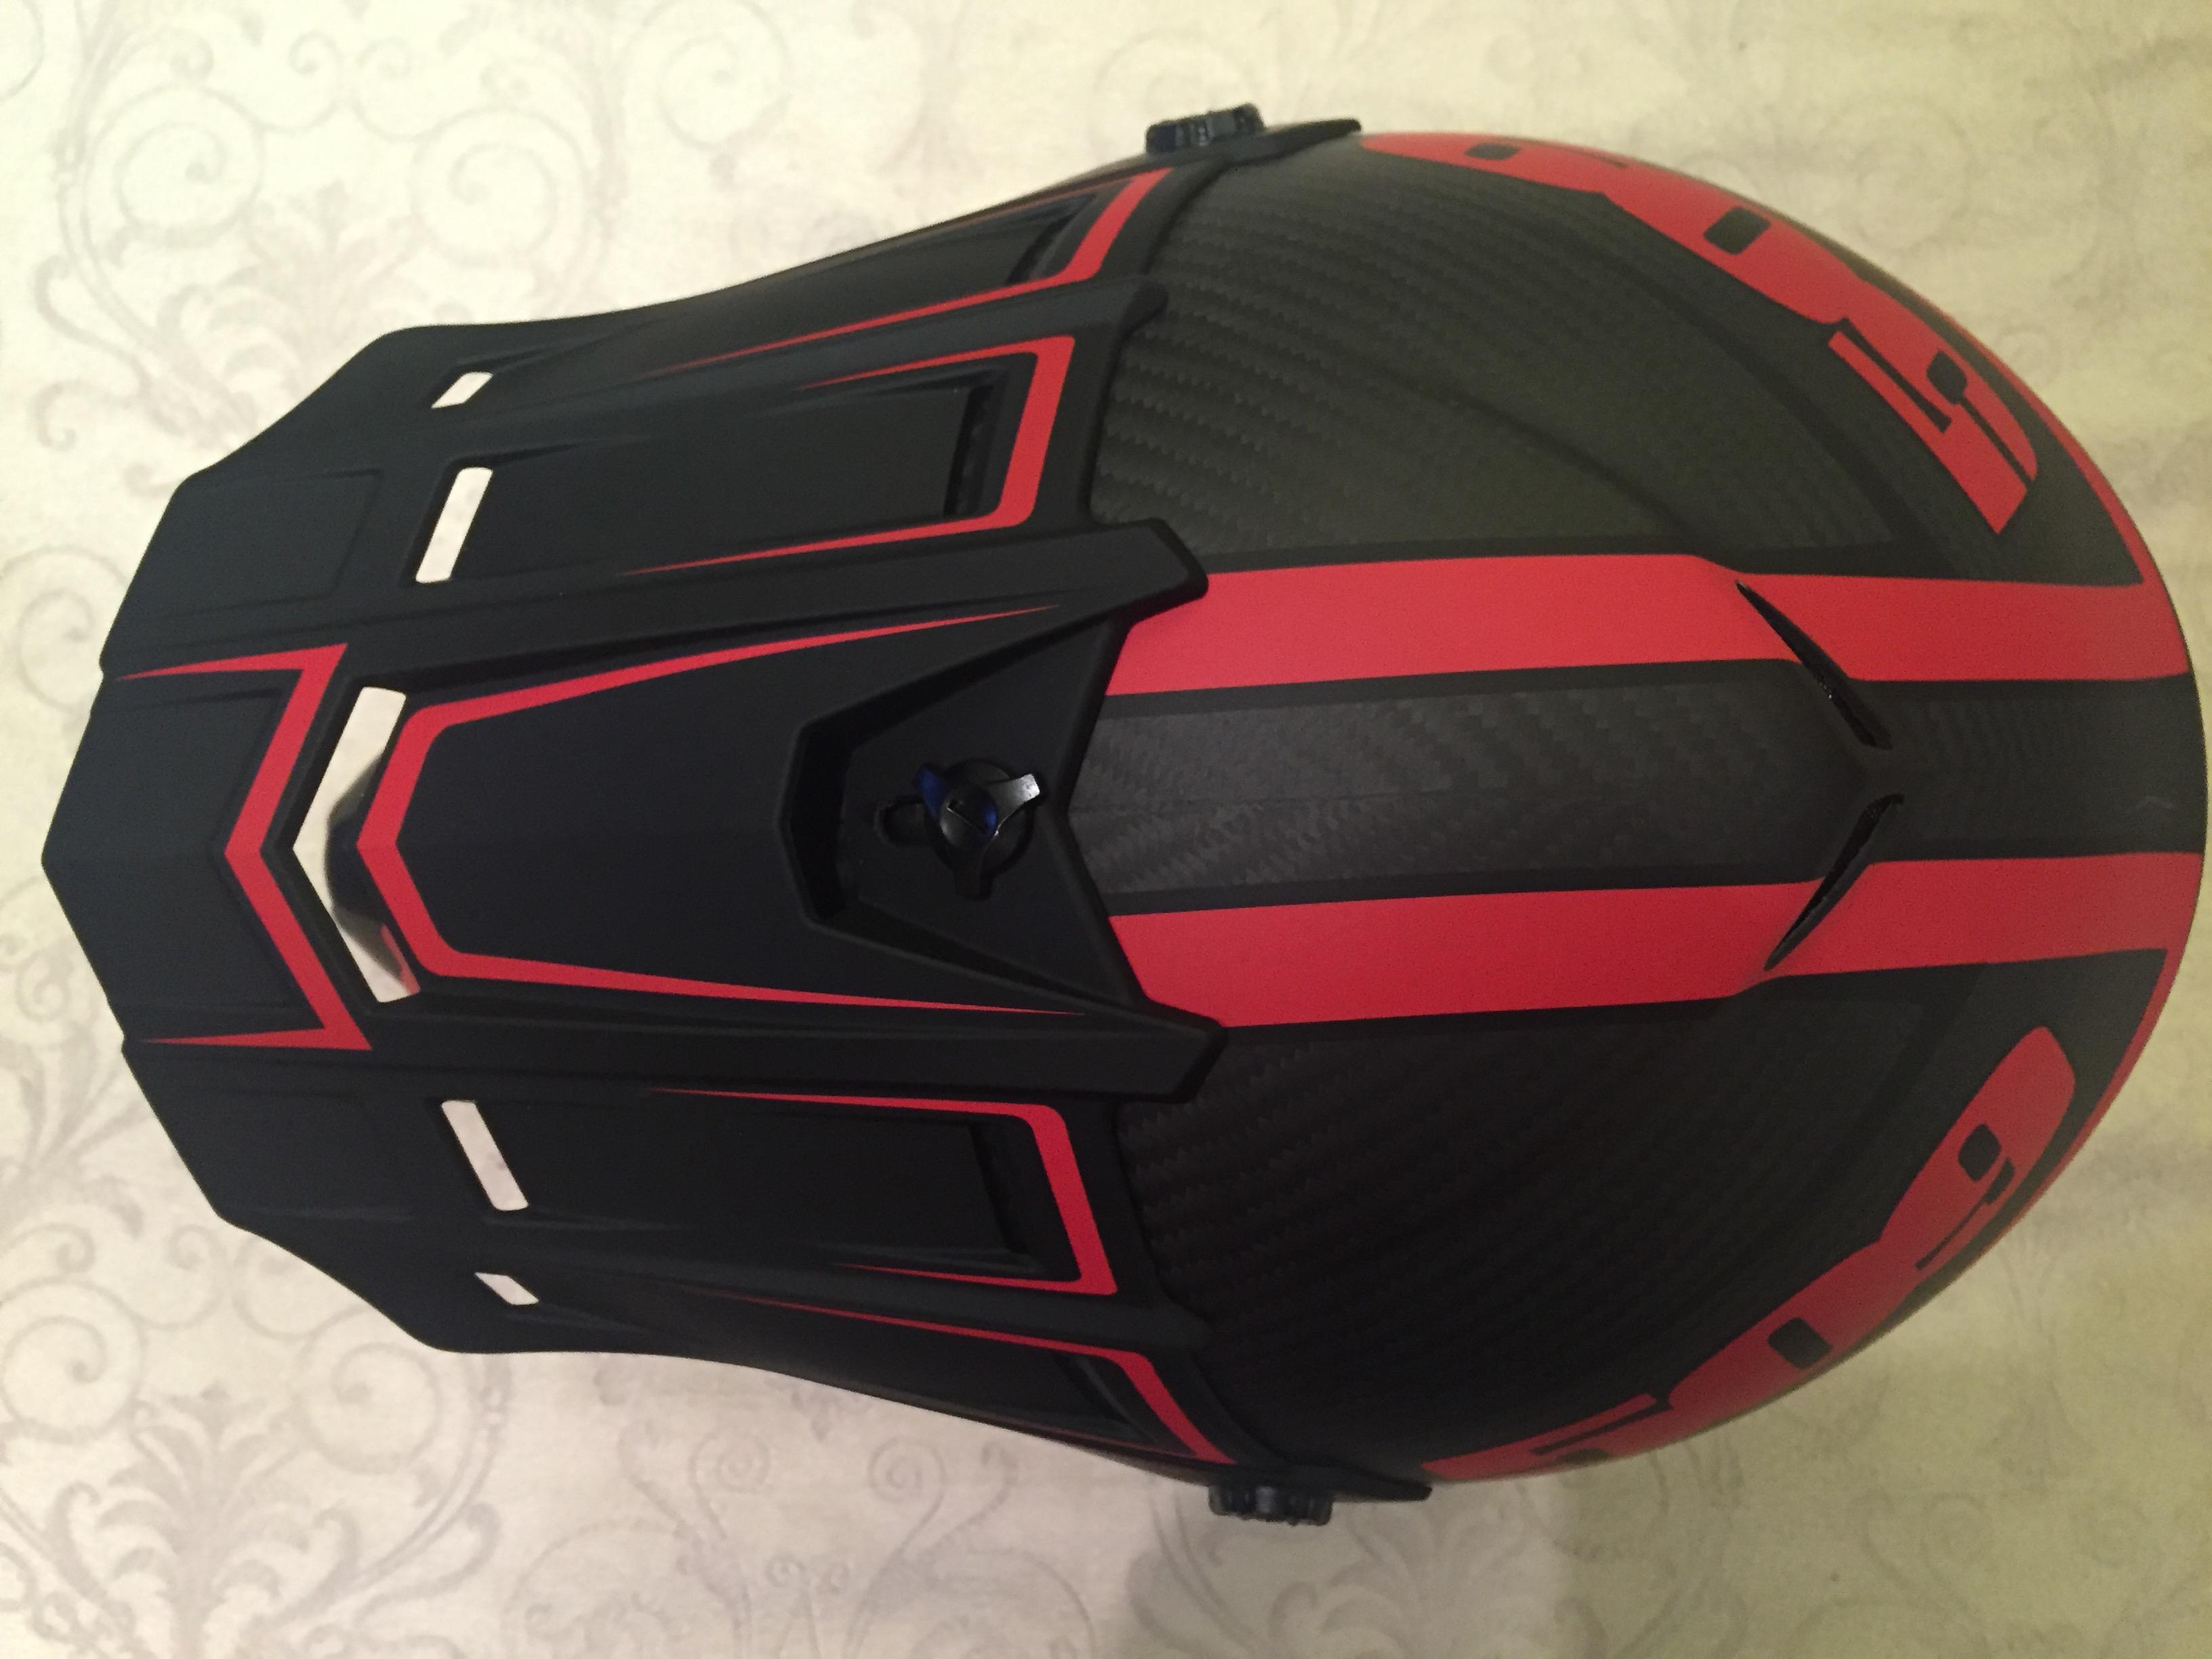 a70e38035550 Продам шлем 509 carbon черно-красный. Новый.   WWW.SNOWMOBILE.RU ...